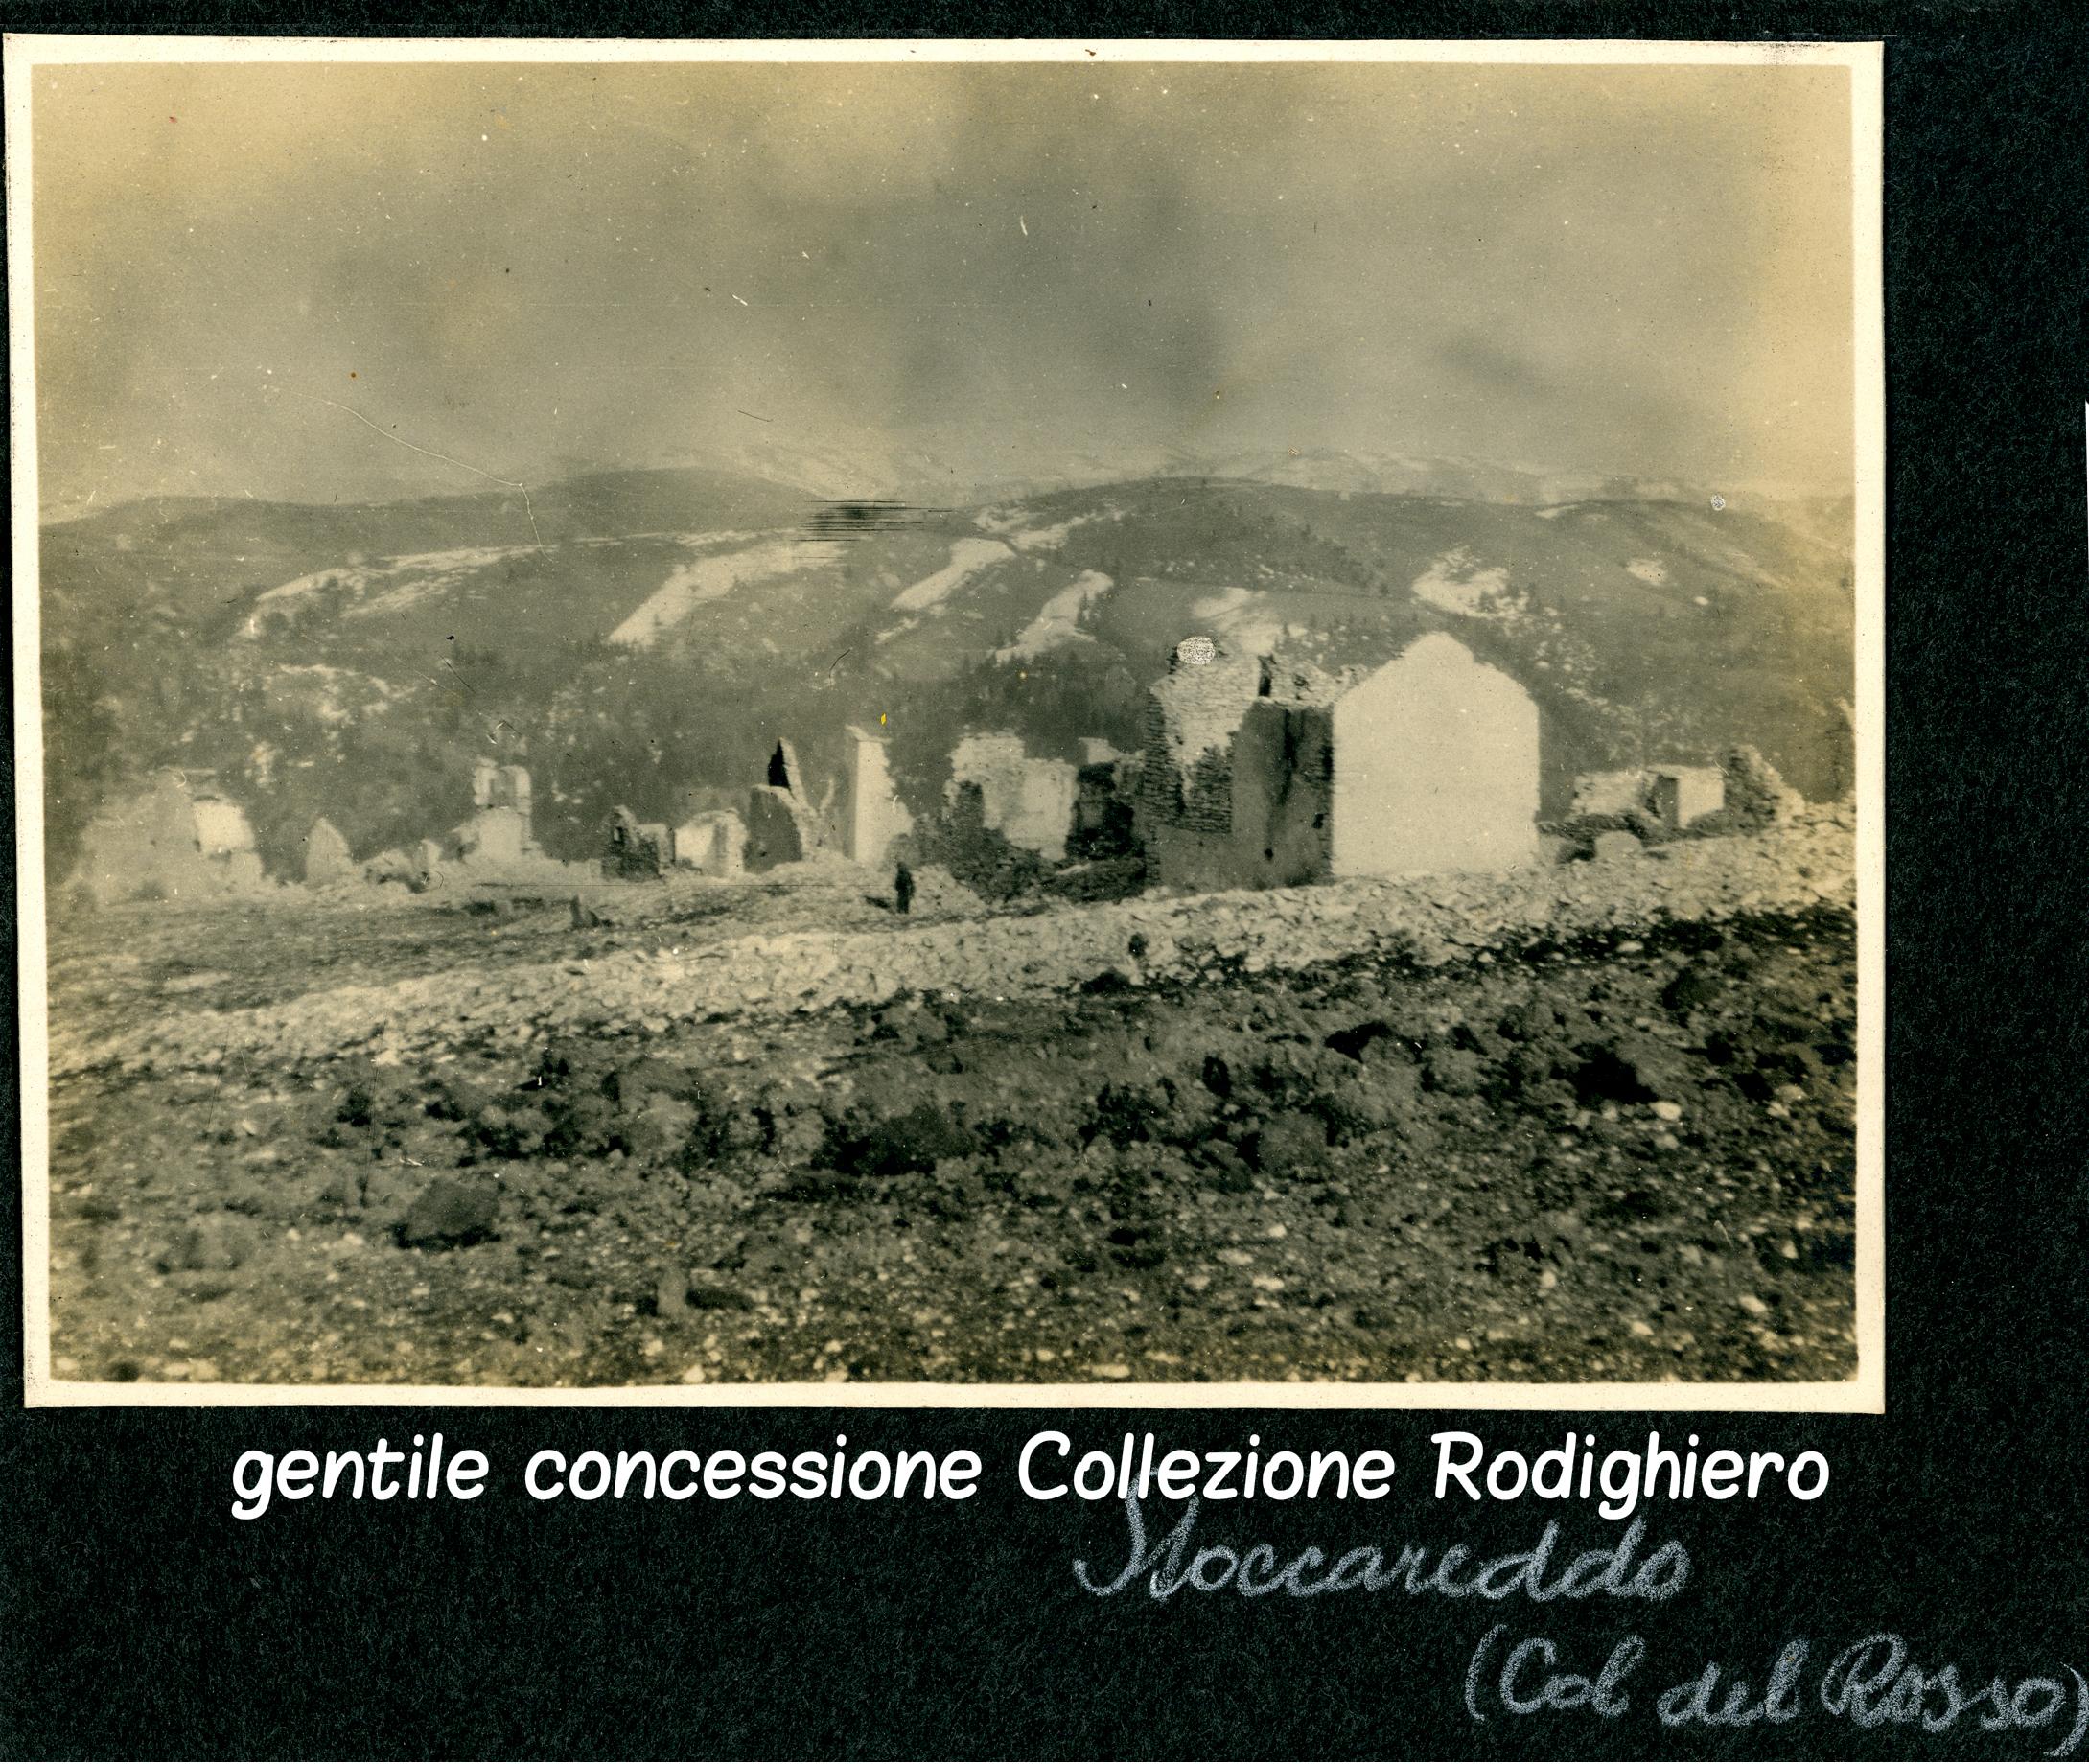 11 - Stoccaredo nel 1918 - (ASDM - coll rodighiero) (c).jpg